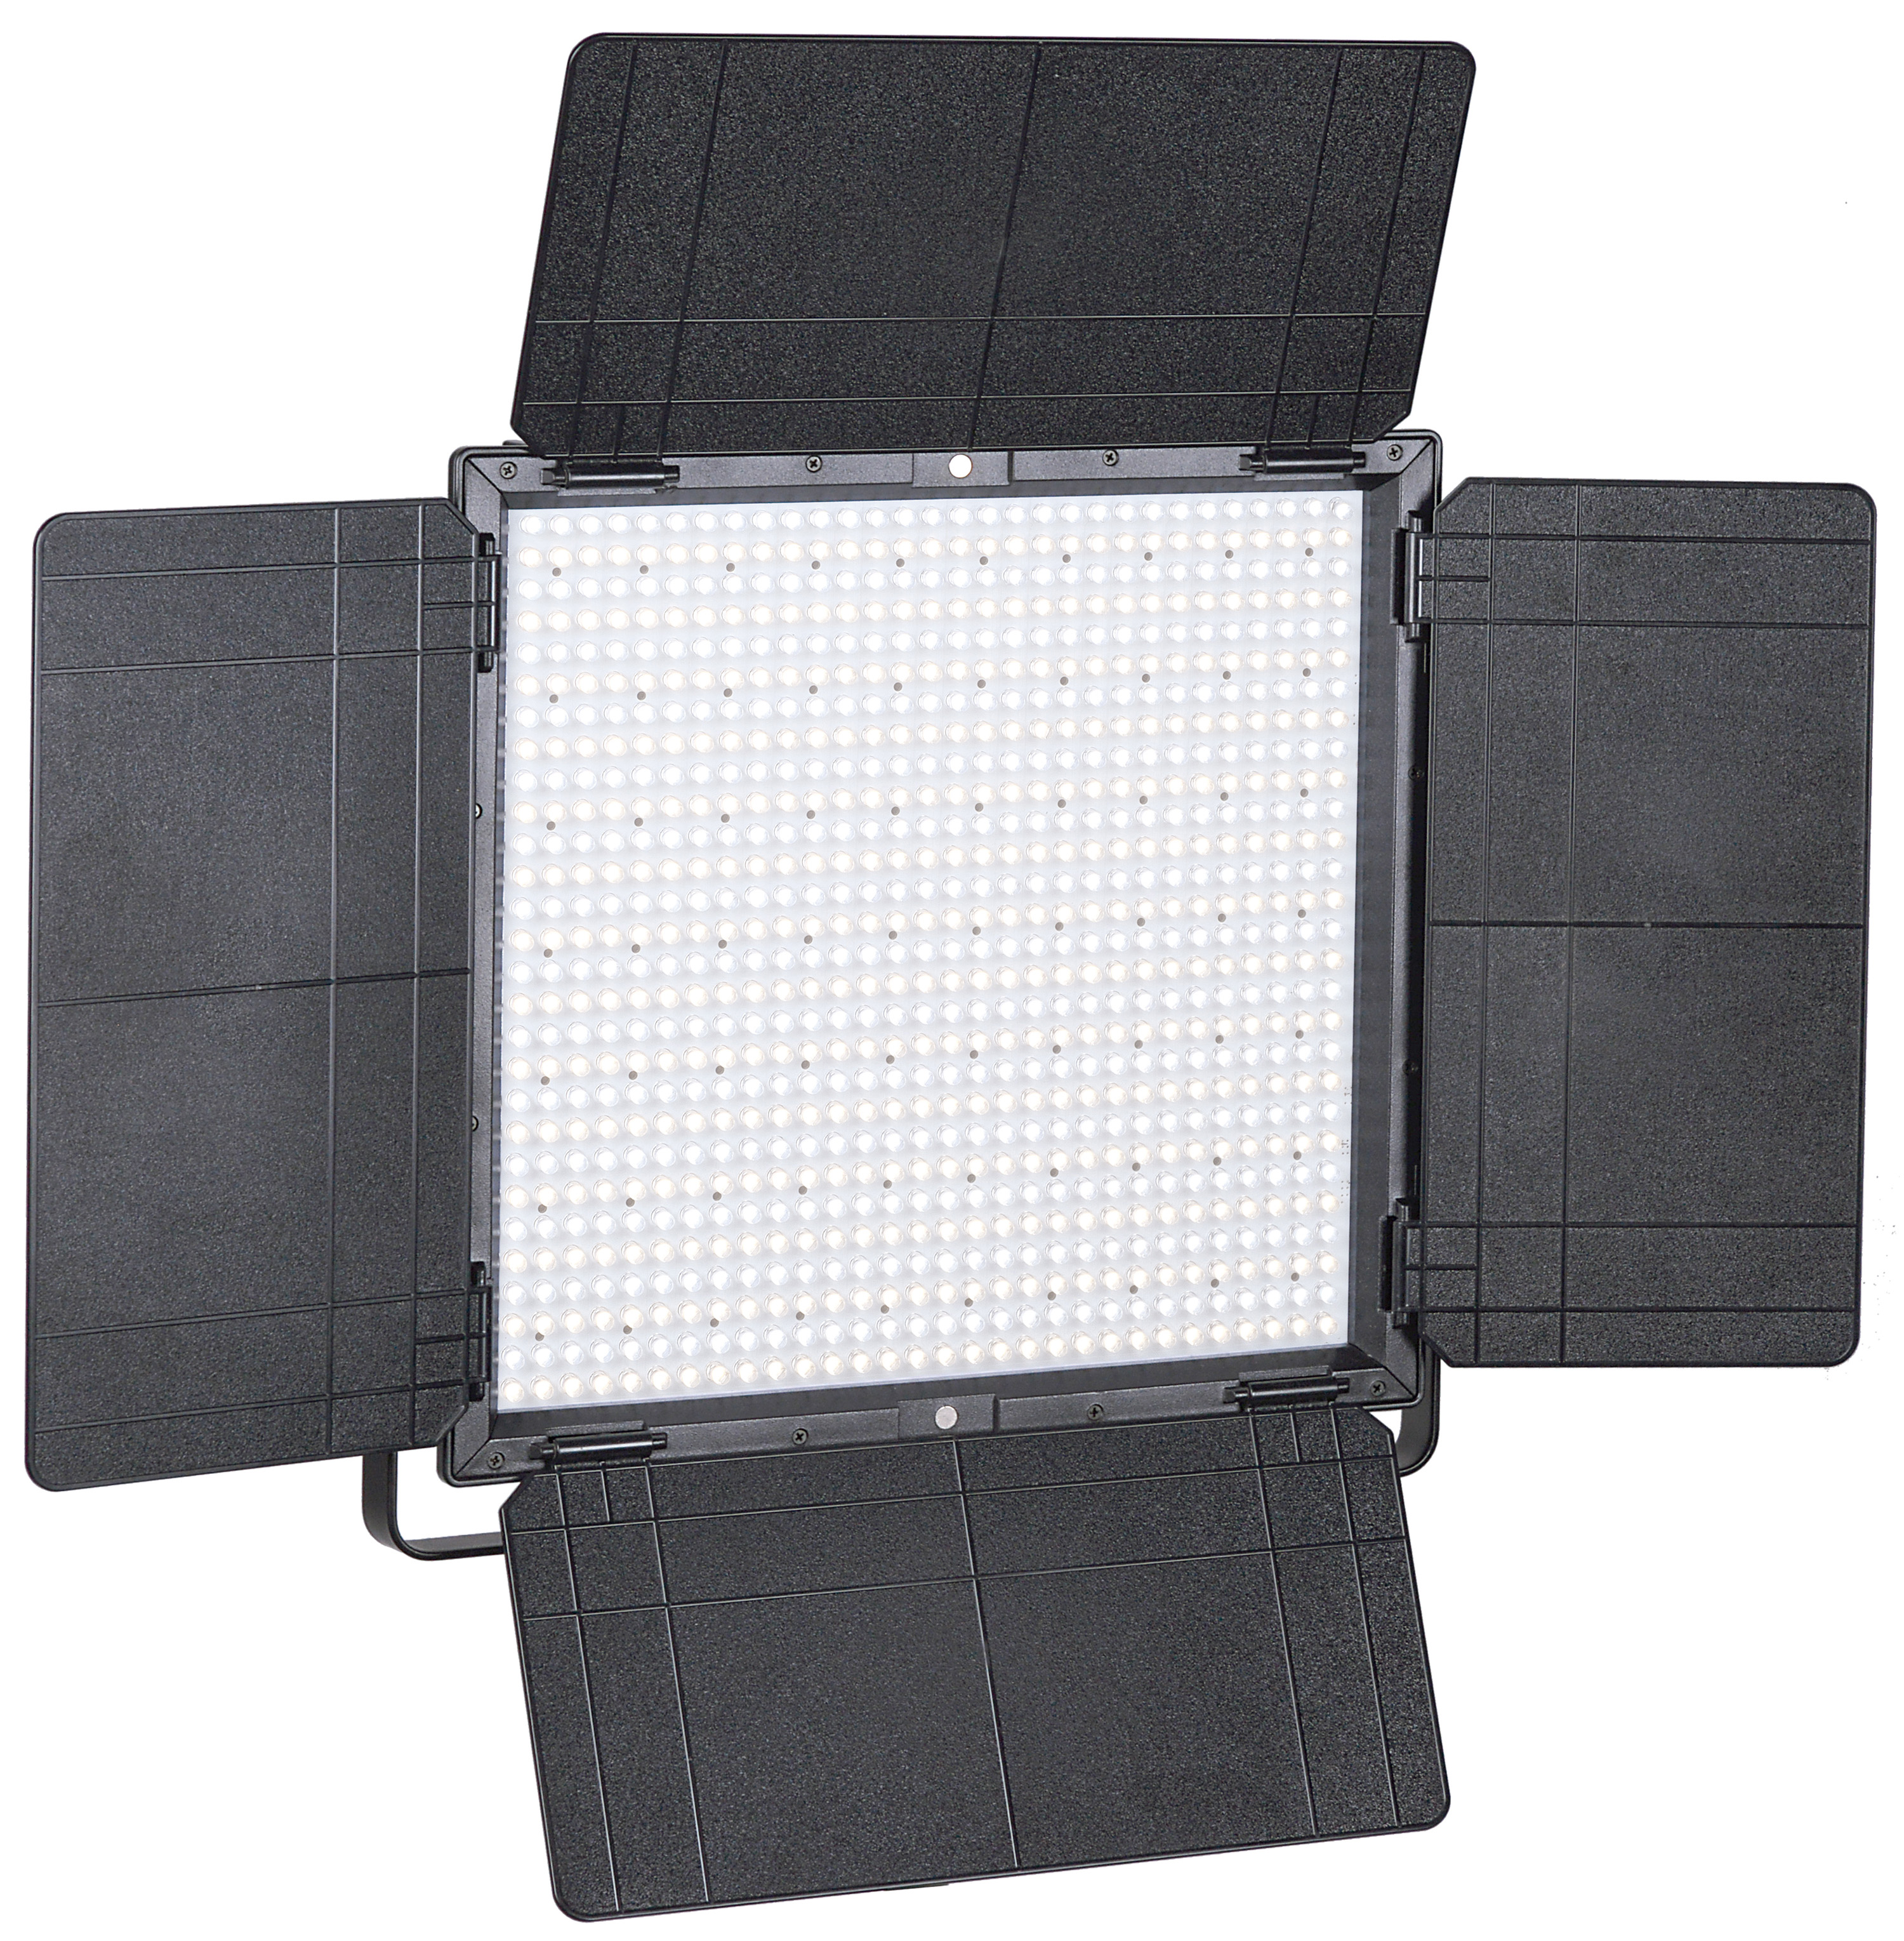 KAISER LED-Flächenleuchte PL 840 Vario, 26x26cm Leuchtfläche, 840 LEDs, dimmbar